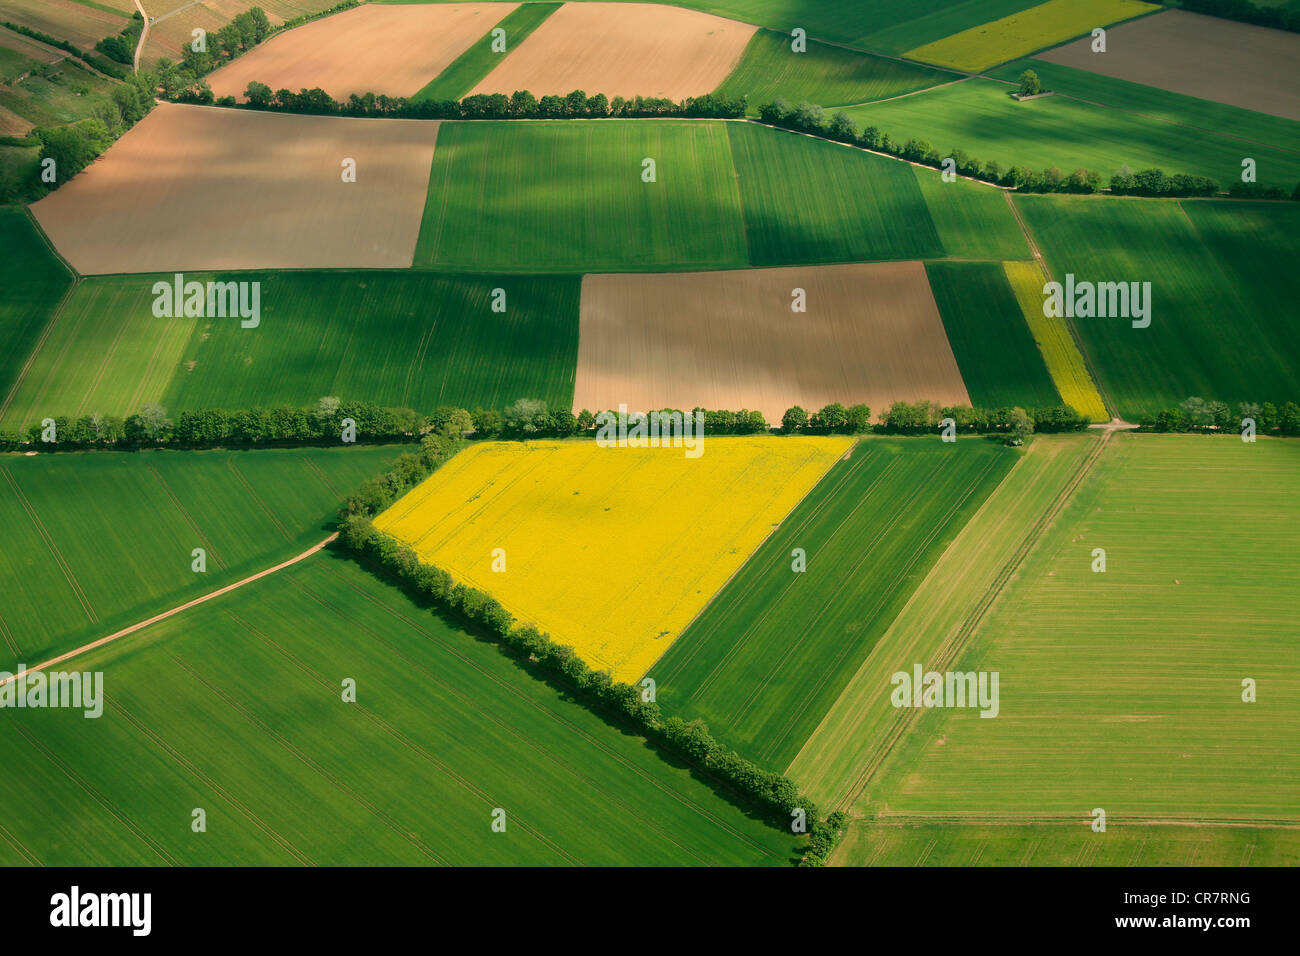 Vista aerea, campi di grano e canola campi separati da siepi, Erbes-Buedesheim, Renania-Palatinato, Germania, Europa Immagini Stock